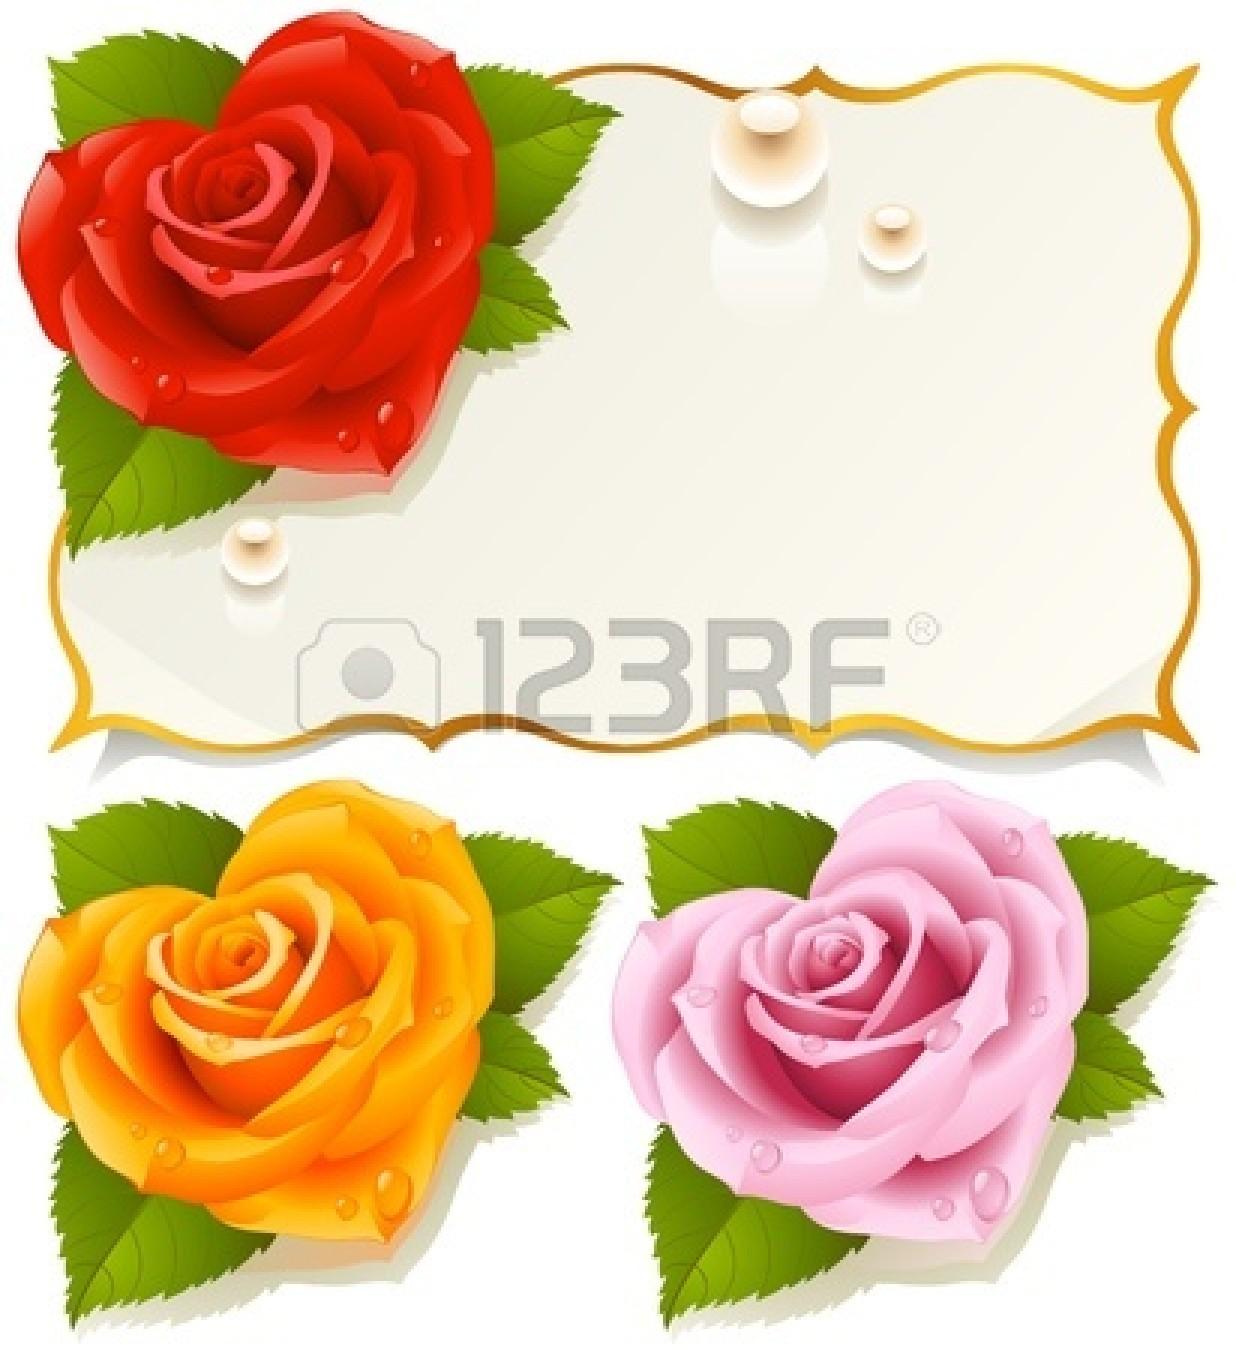 Yellow Rose Border Clip Art N5 free image.